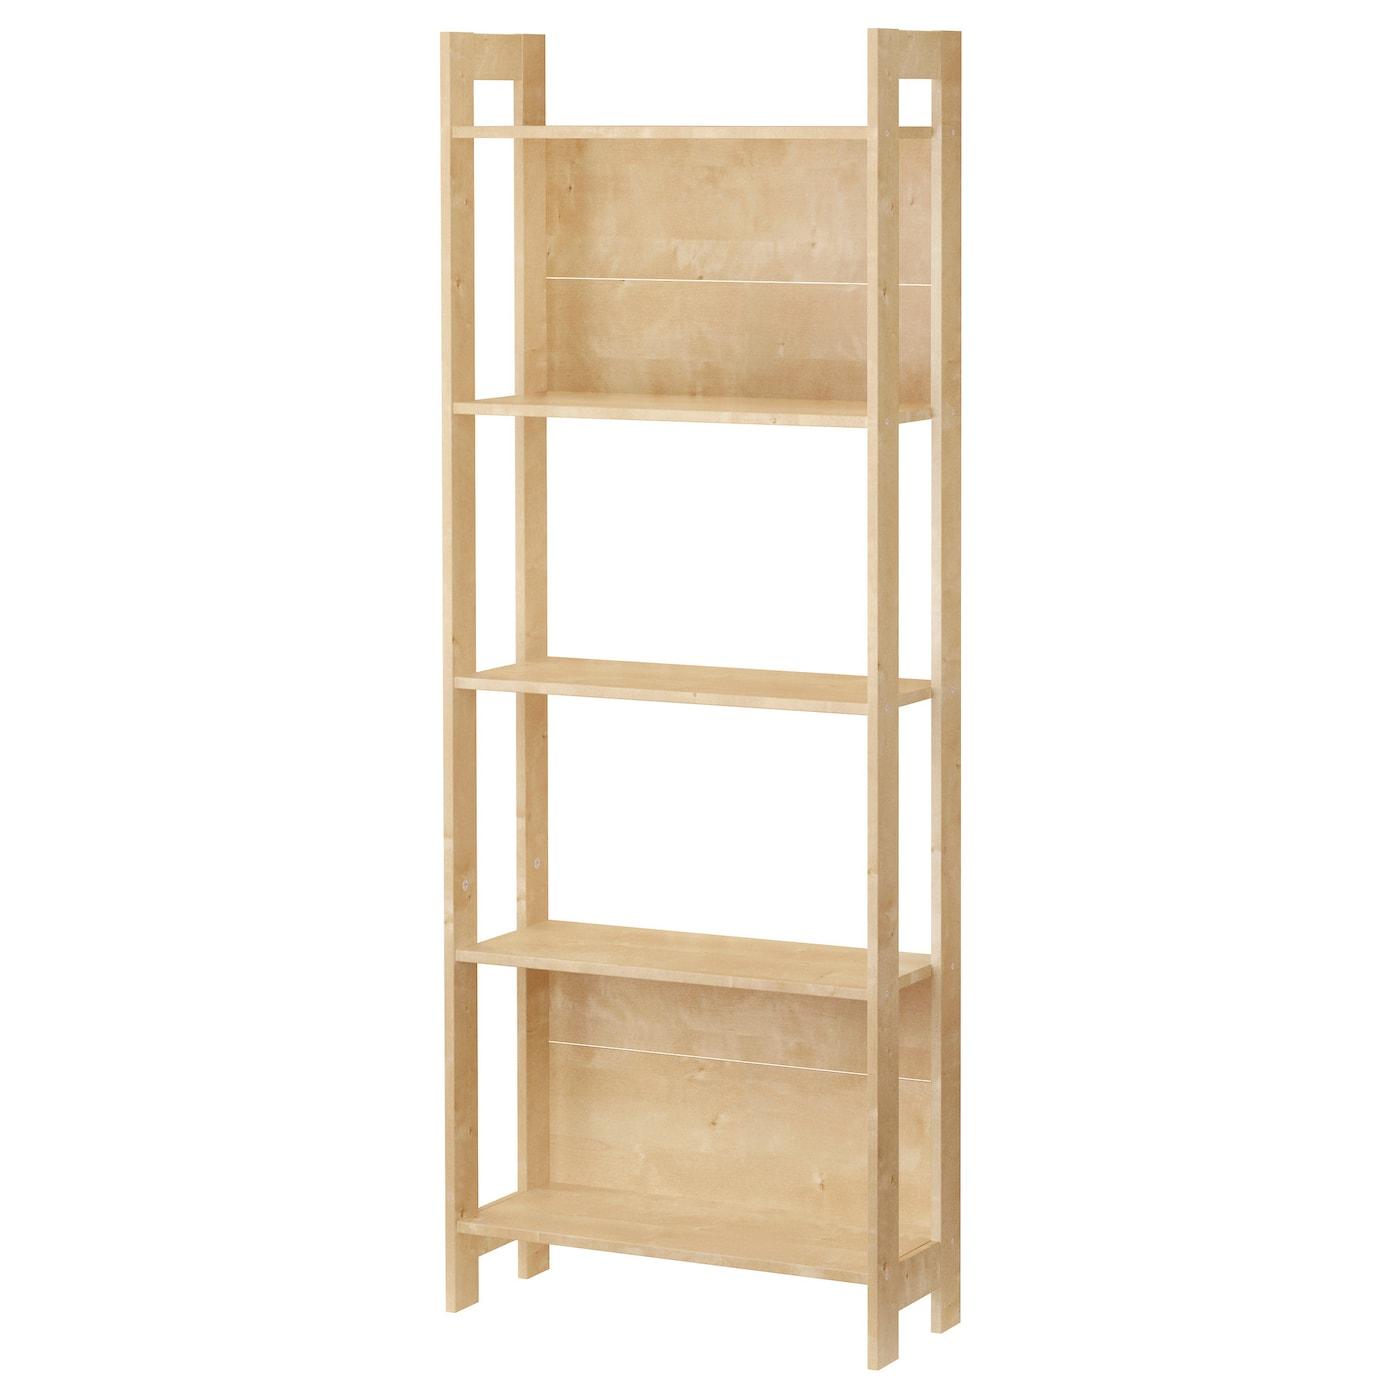 Ikea holzregal  LAIVA Bookcase Birch effect 62x165 cm - IKEA